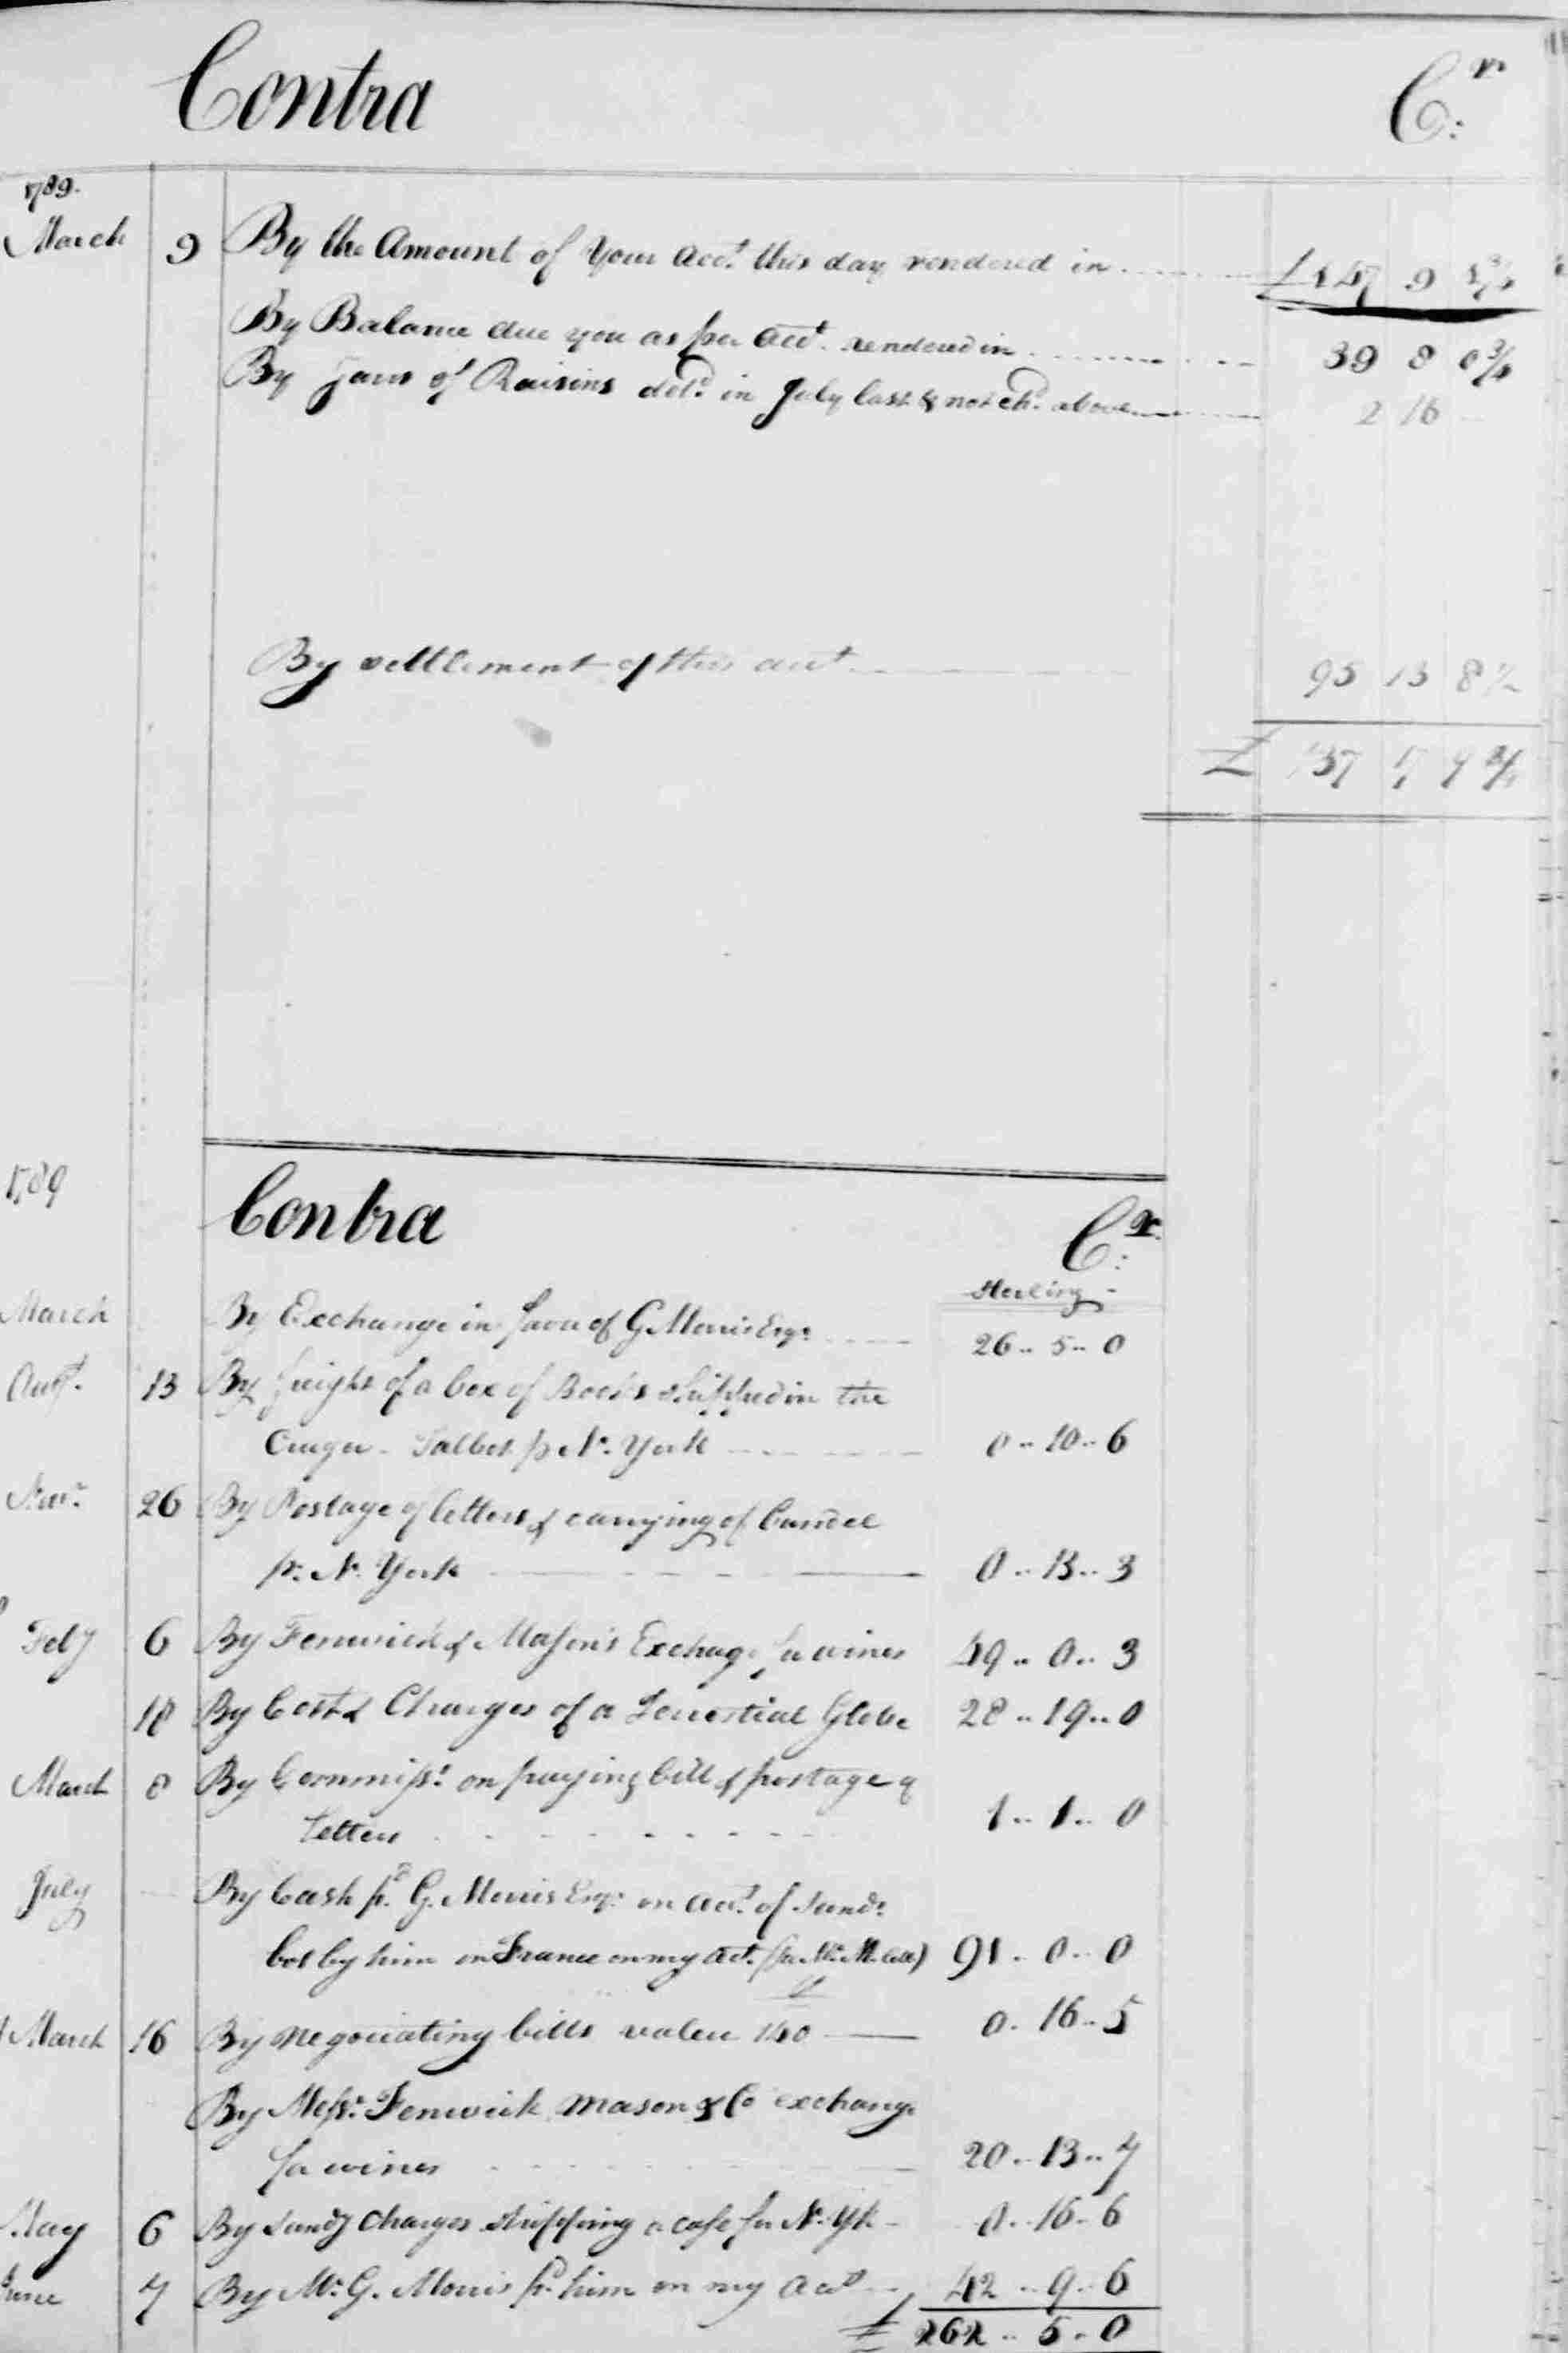 Ledger B, folio 302, right side